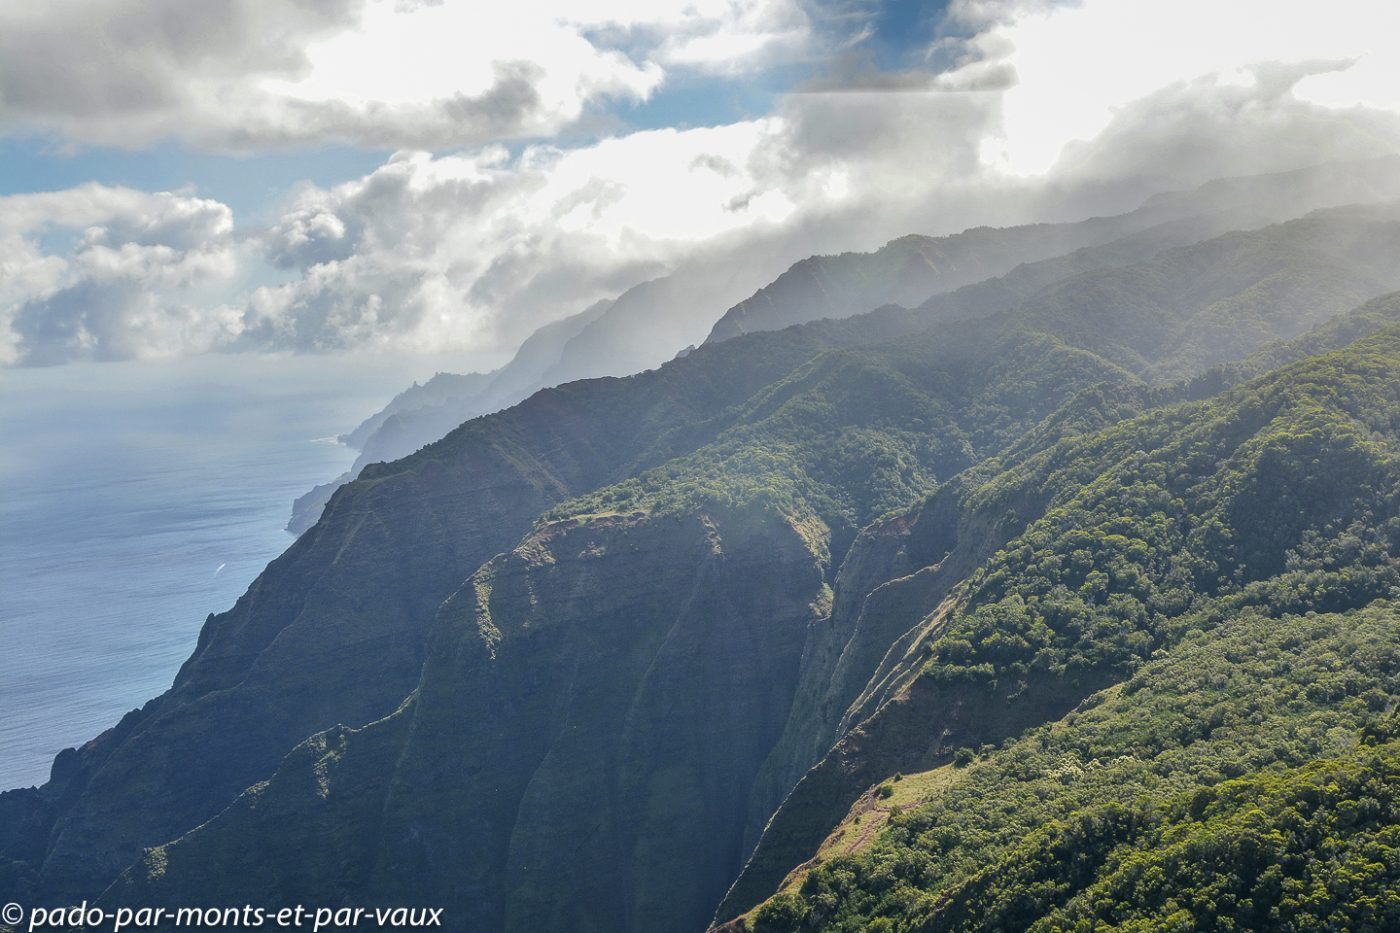 Kauai - survol de l'île